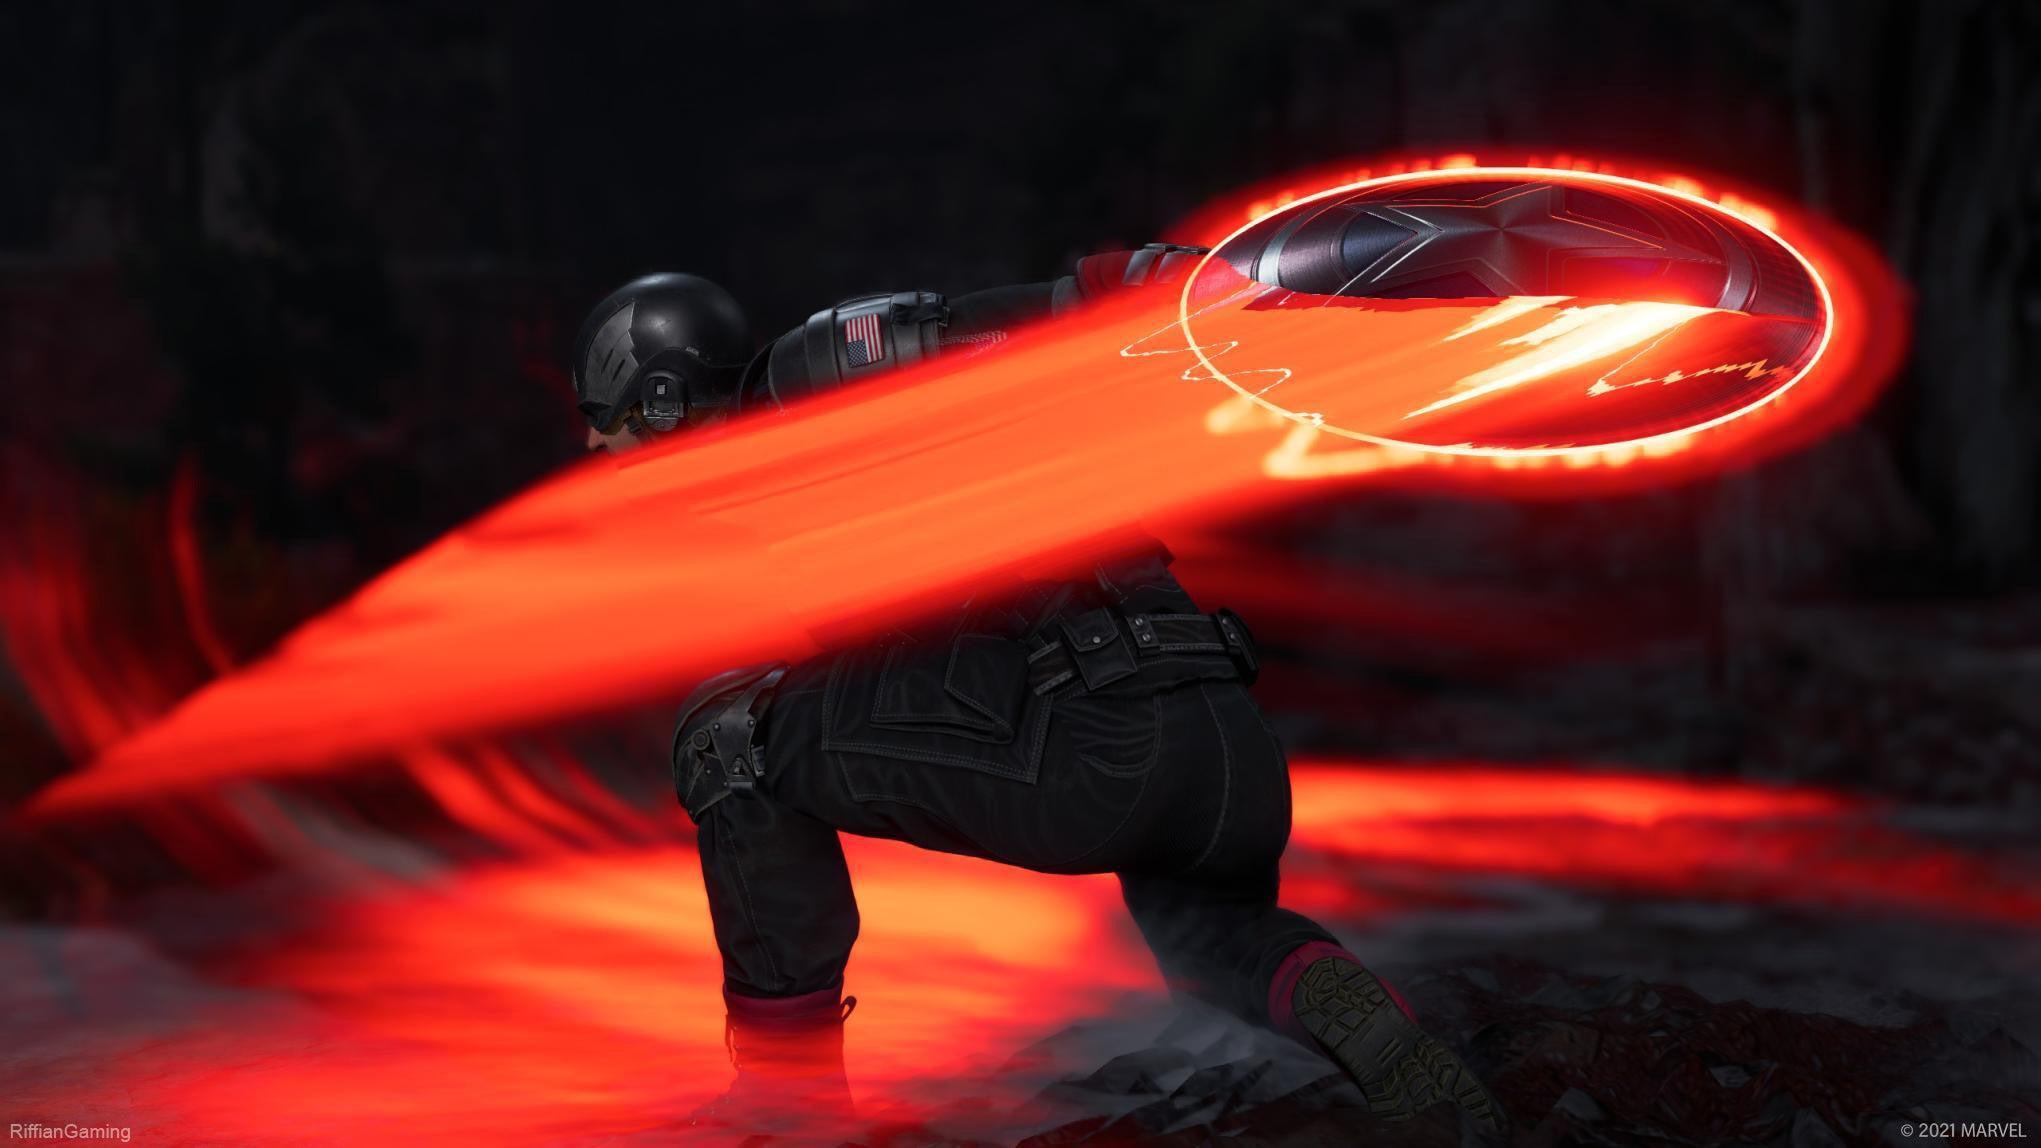 Captain America throws his shield, which glows orange.